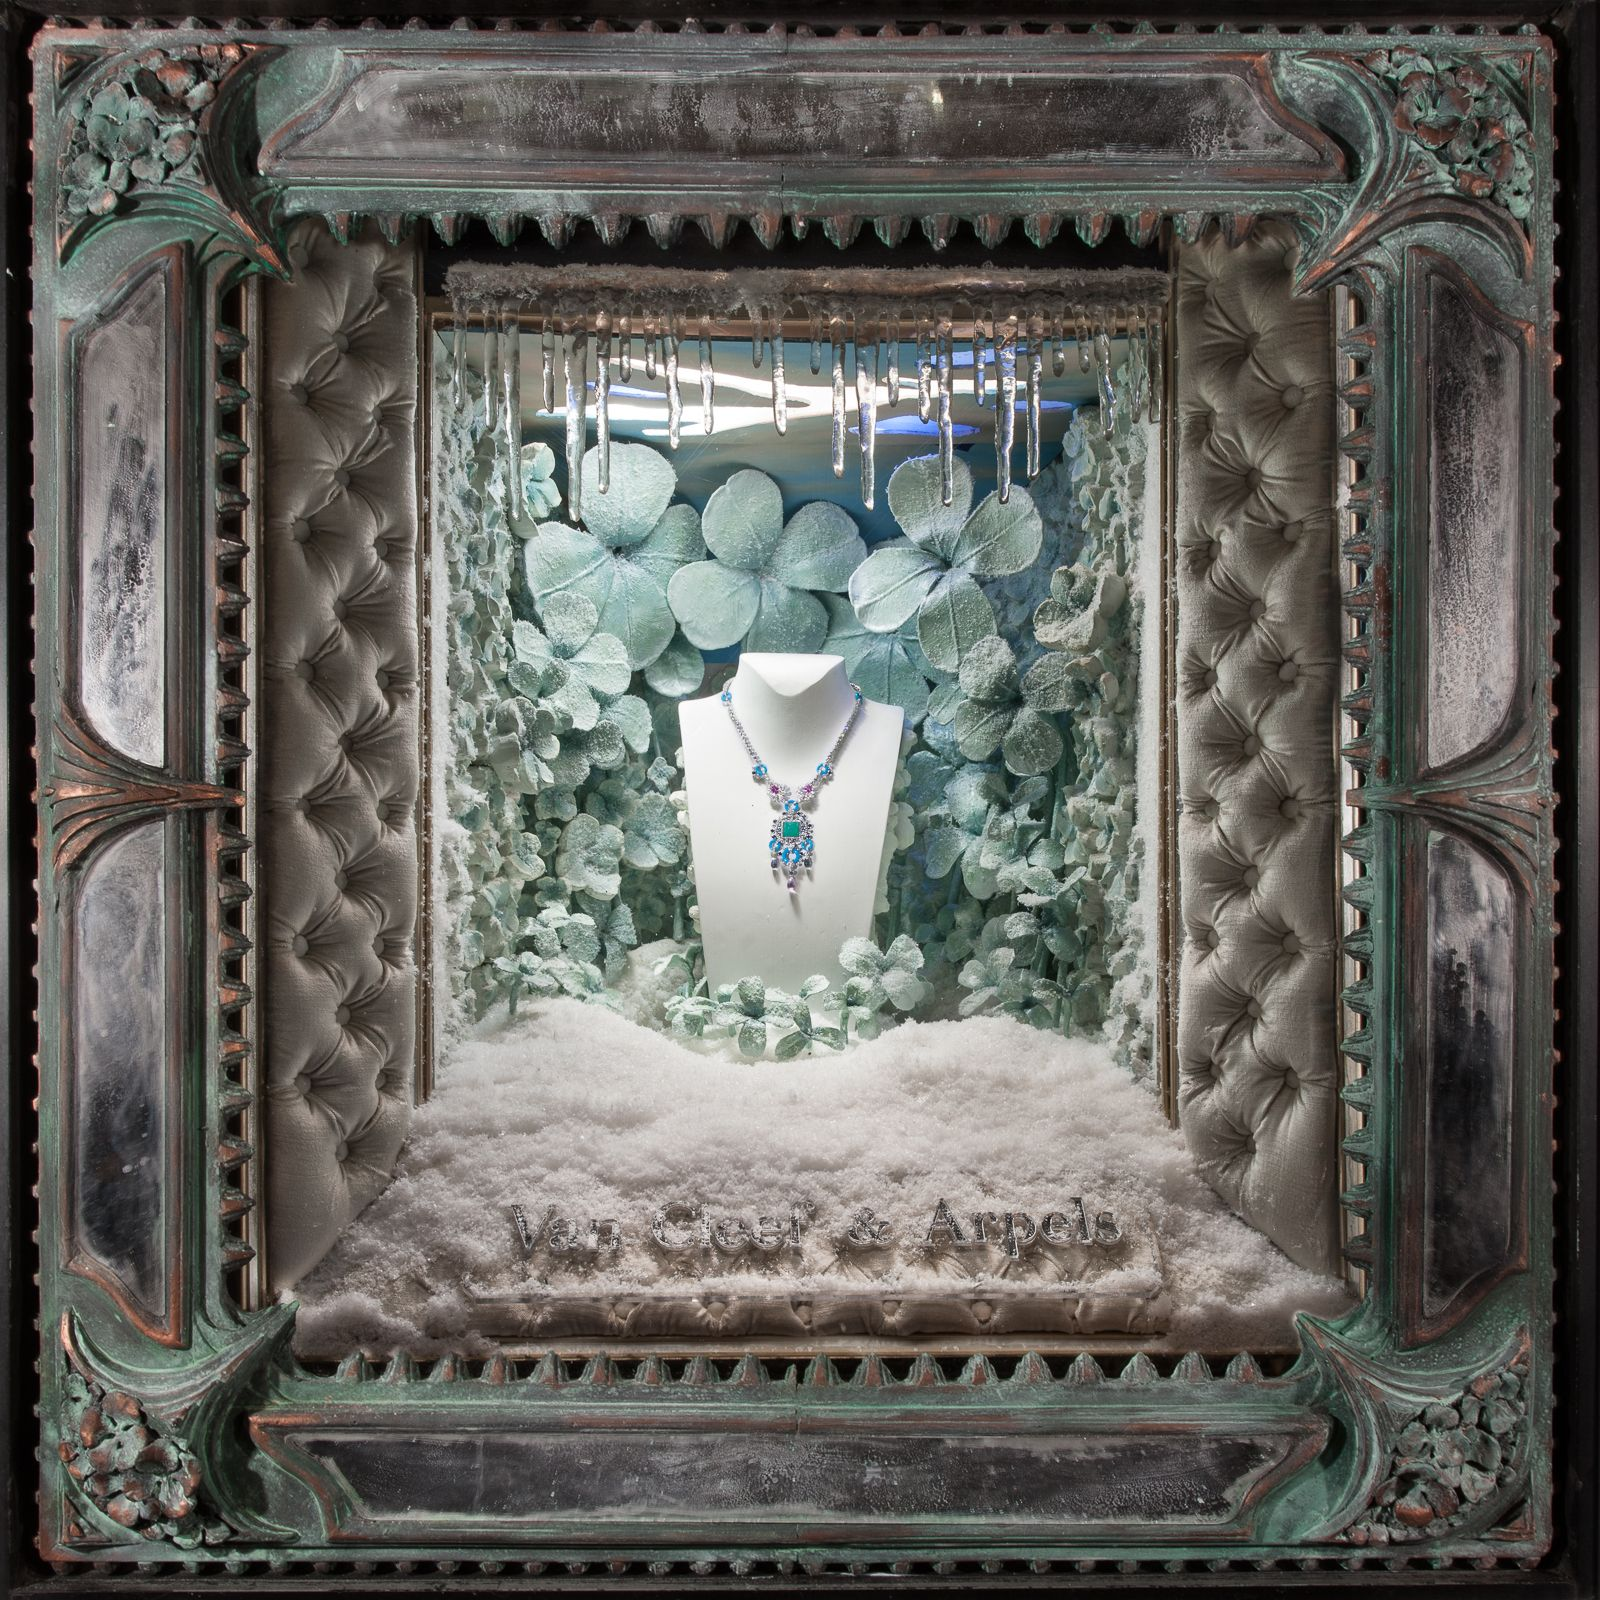 holiday season window displays 2012 by douglas little van